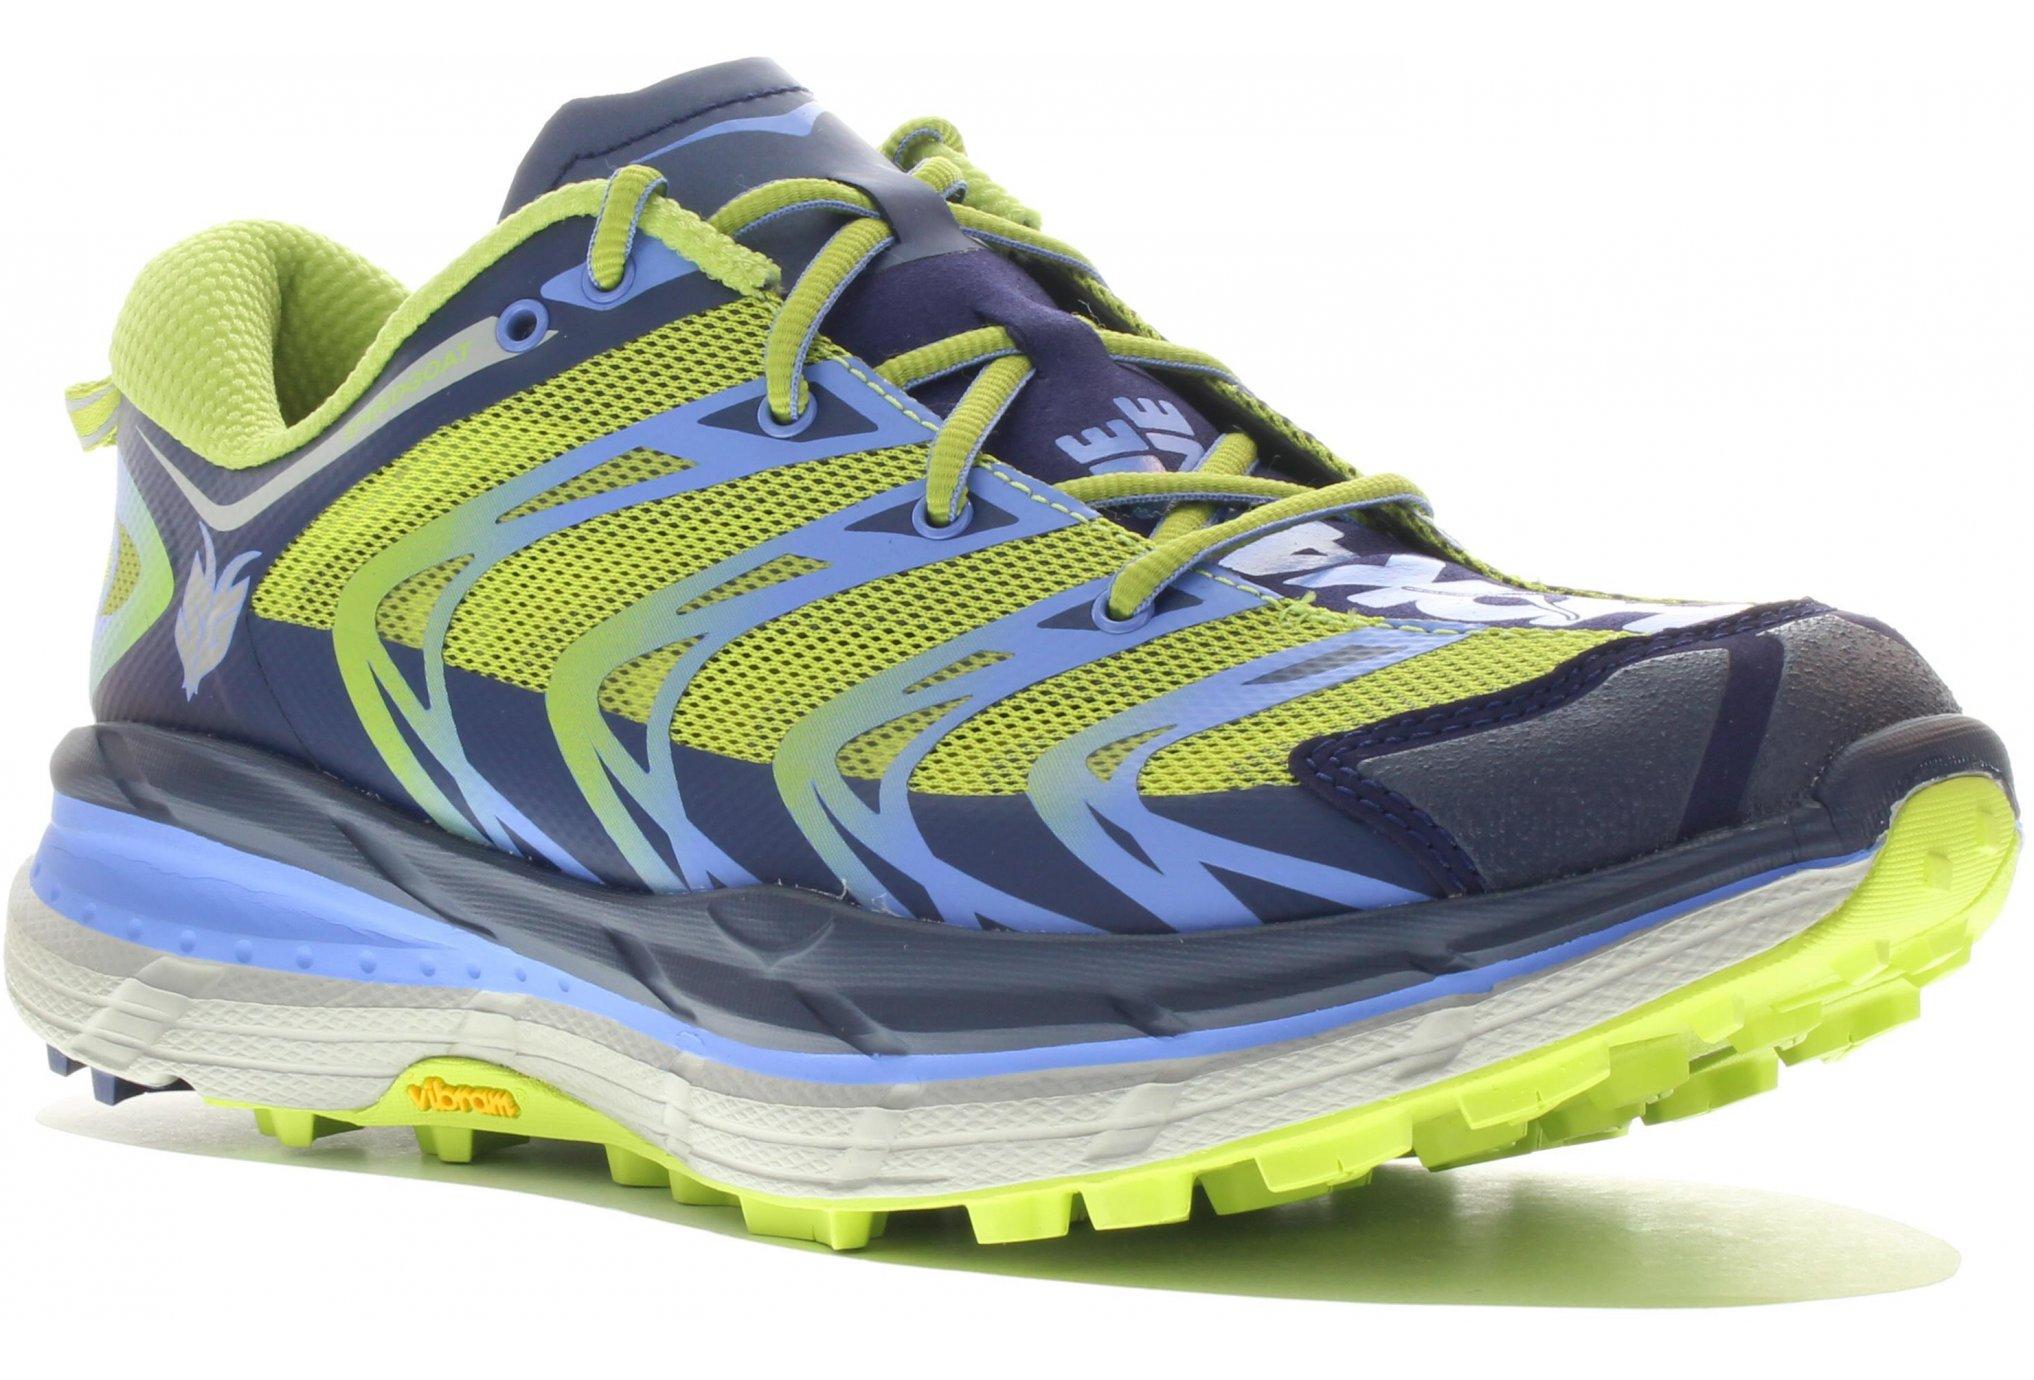 Hoka One One SpeedGoat W Chaussures running femme